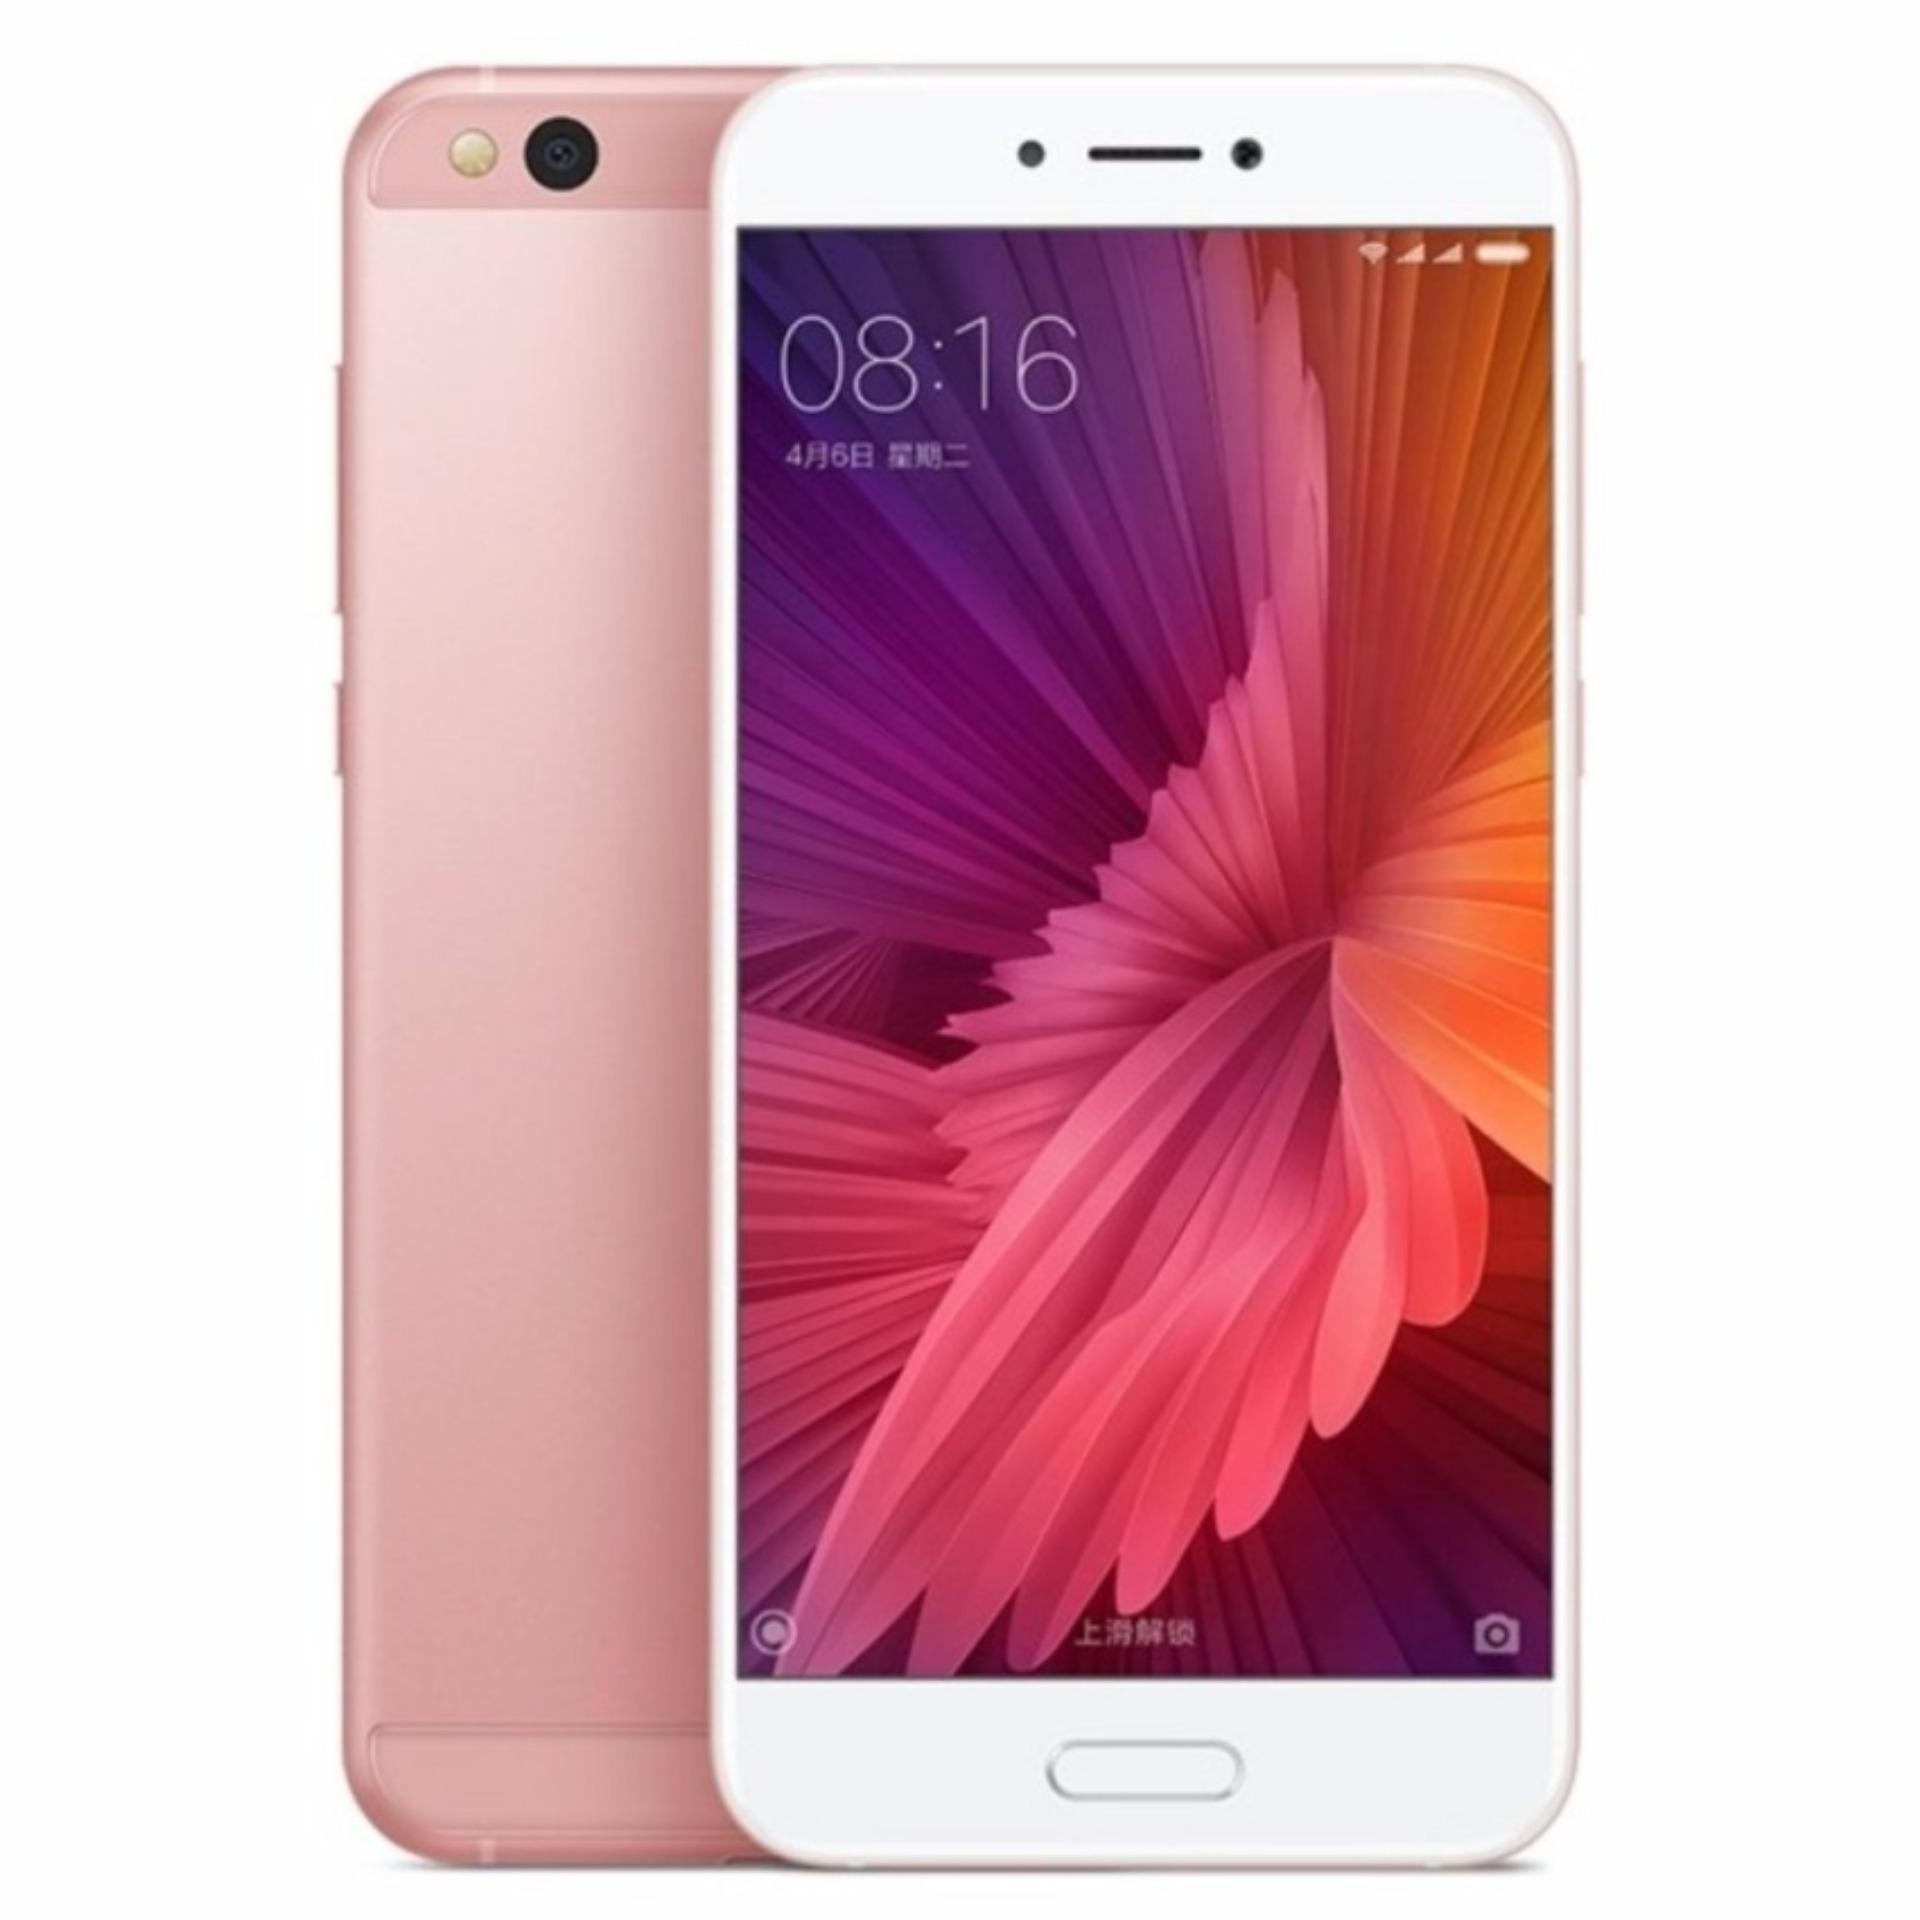 Beli Flash Sale Xiaomi Redmi 2 Snapdragon 410 4g Lte Garansi 1tahun Ram 1gb Internal 8gb Distributor 1 Th Mi 5c 3gb 64gb Tahun